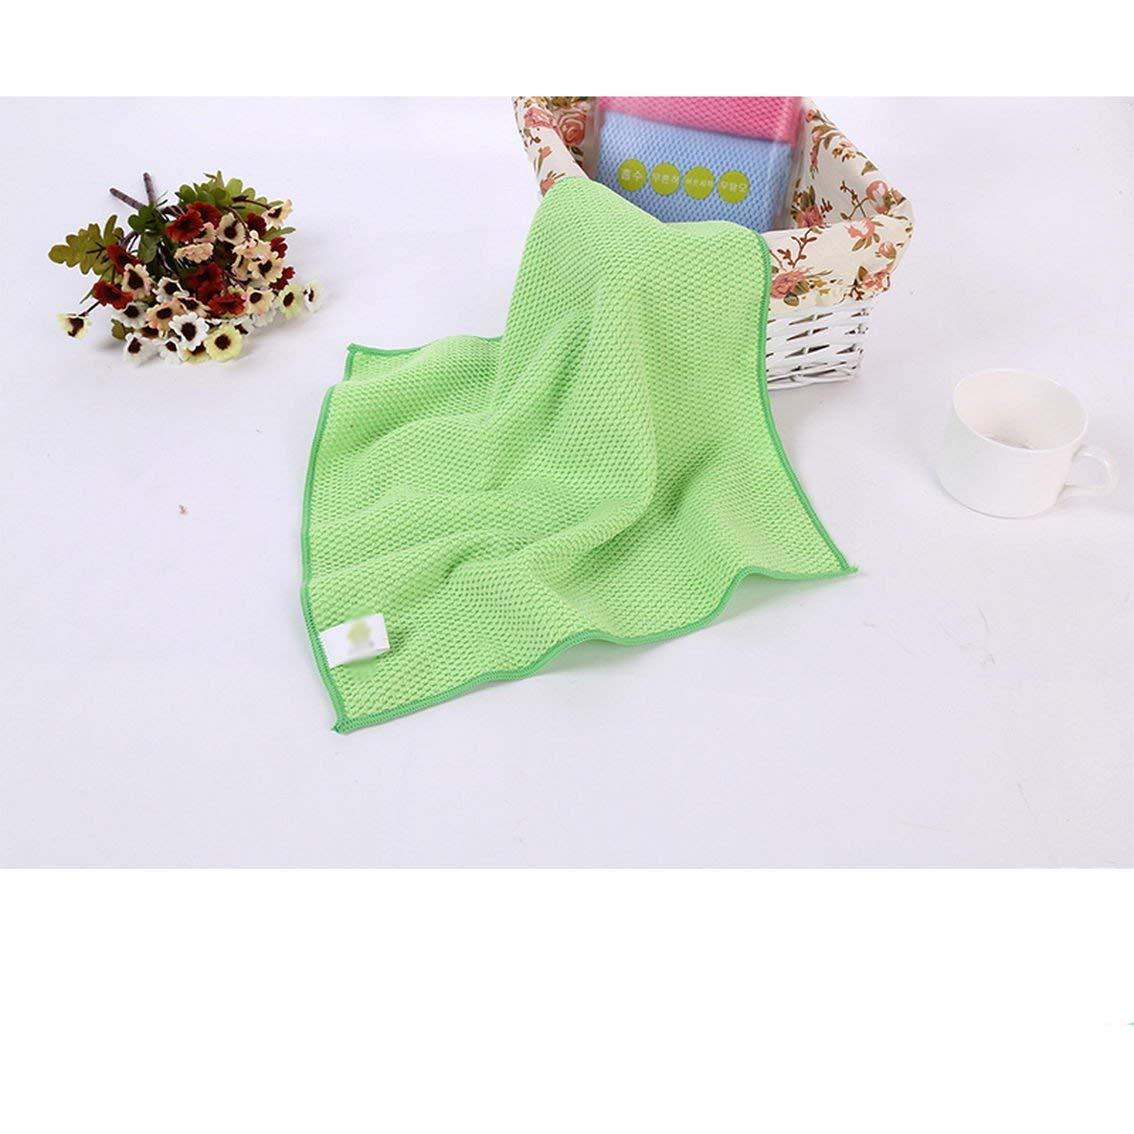 Buy jii2030shann Lint-free absorbent cloth scouring pad ...